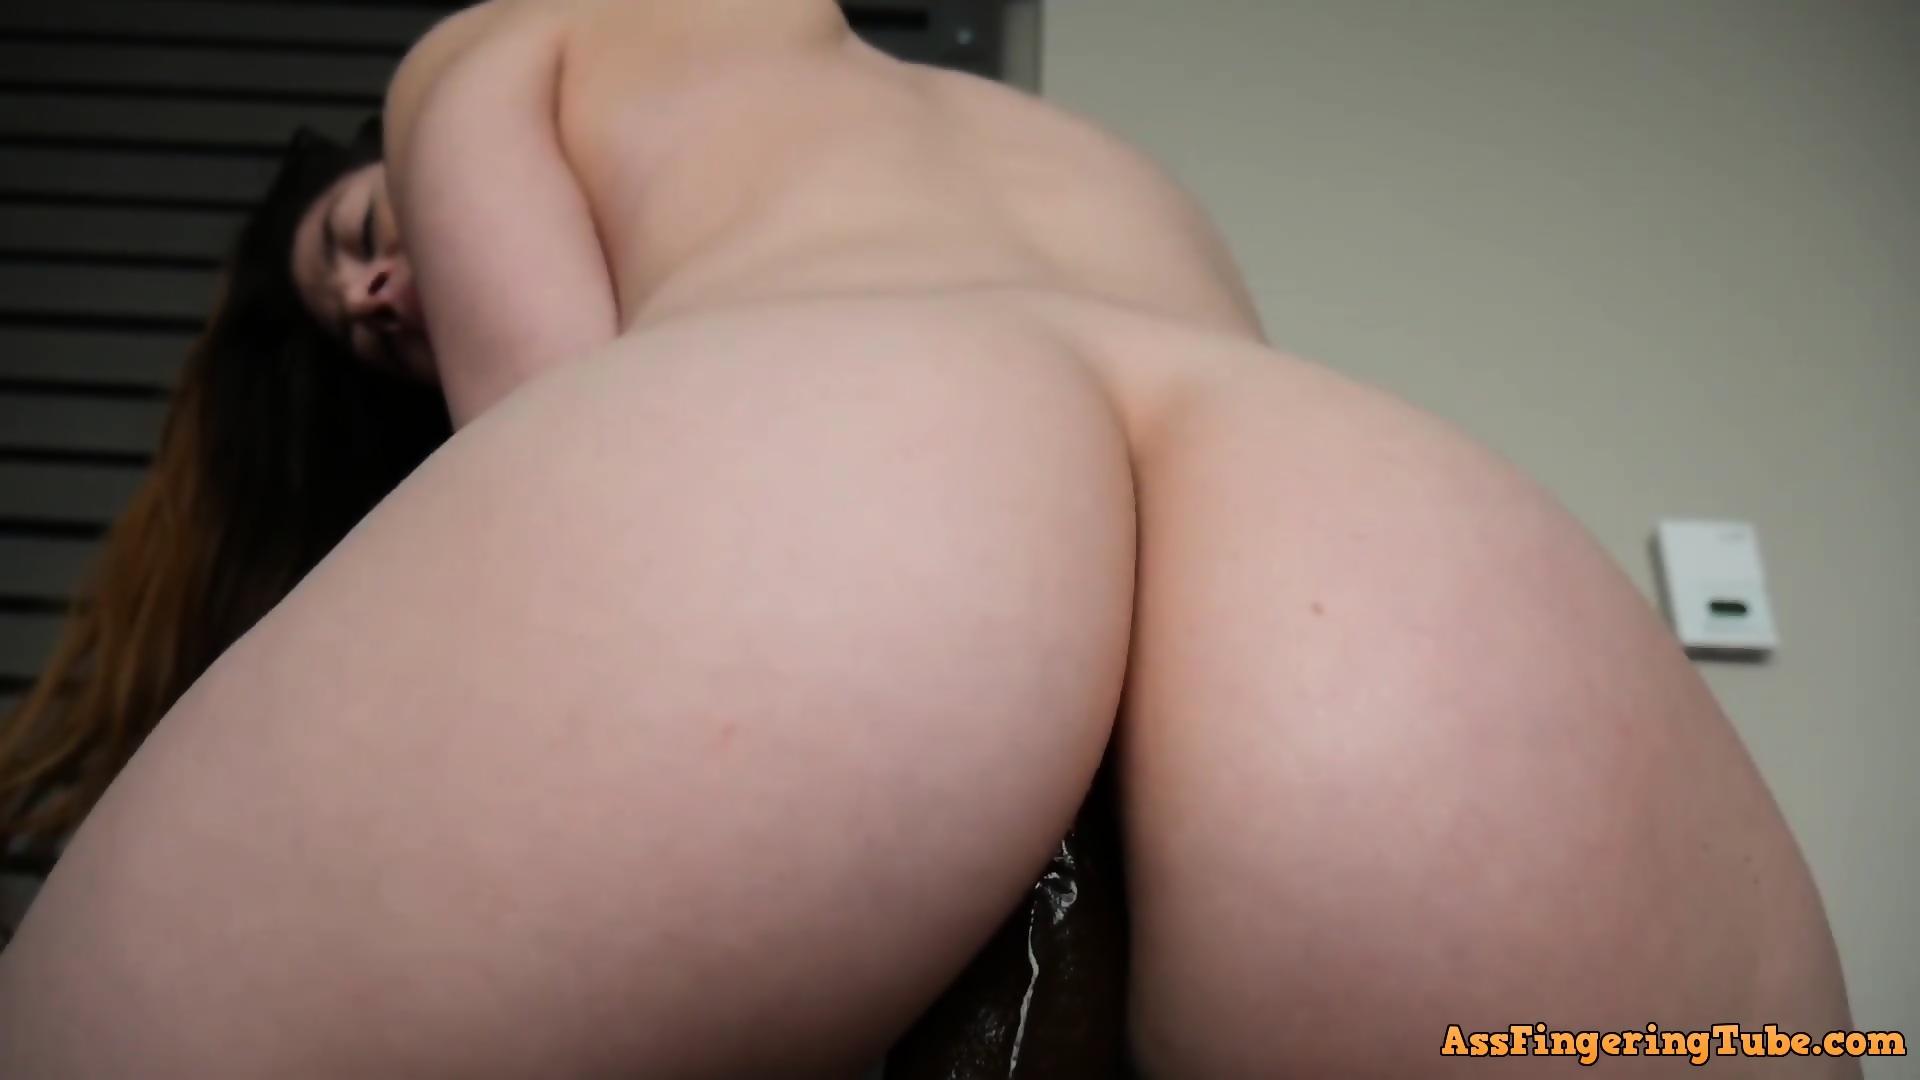 Nude pics Brynn tyler fucked big brother love